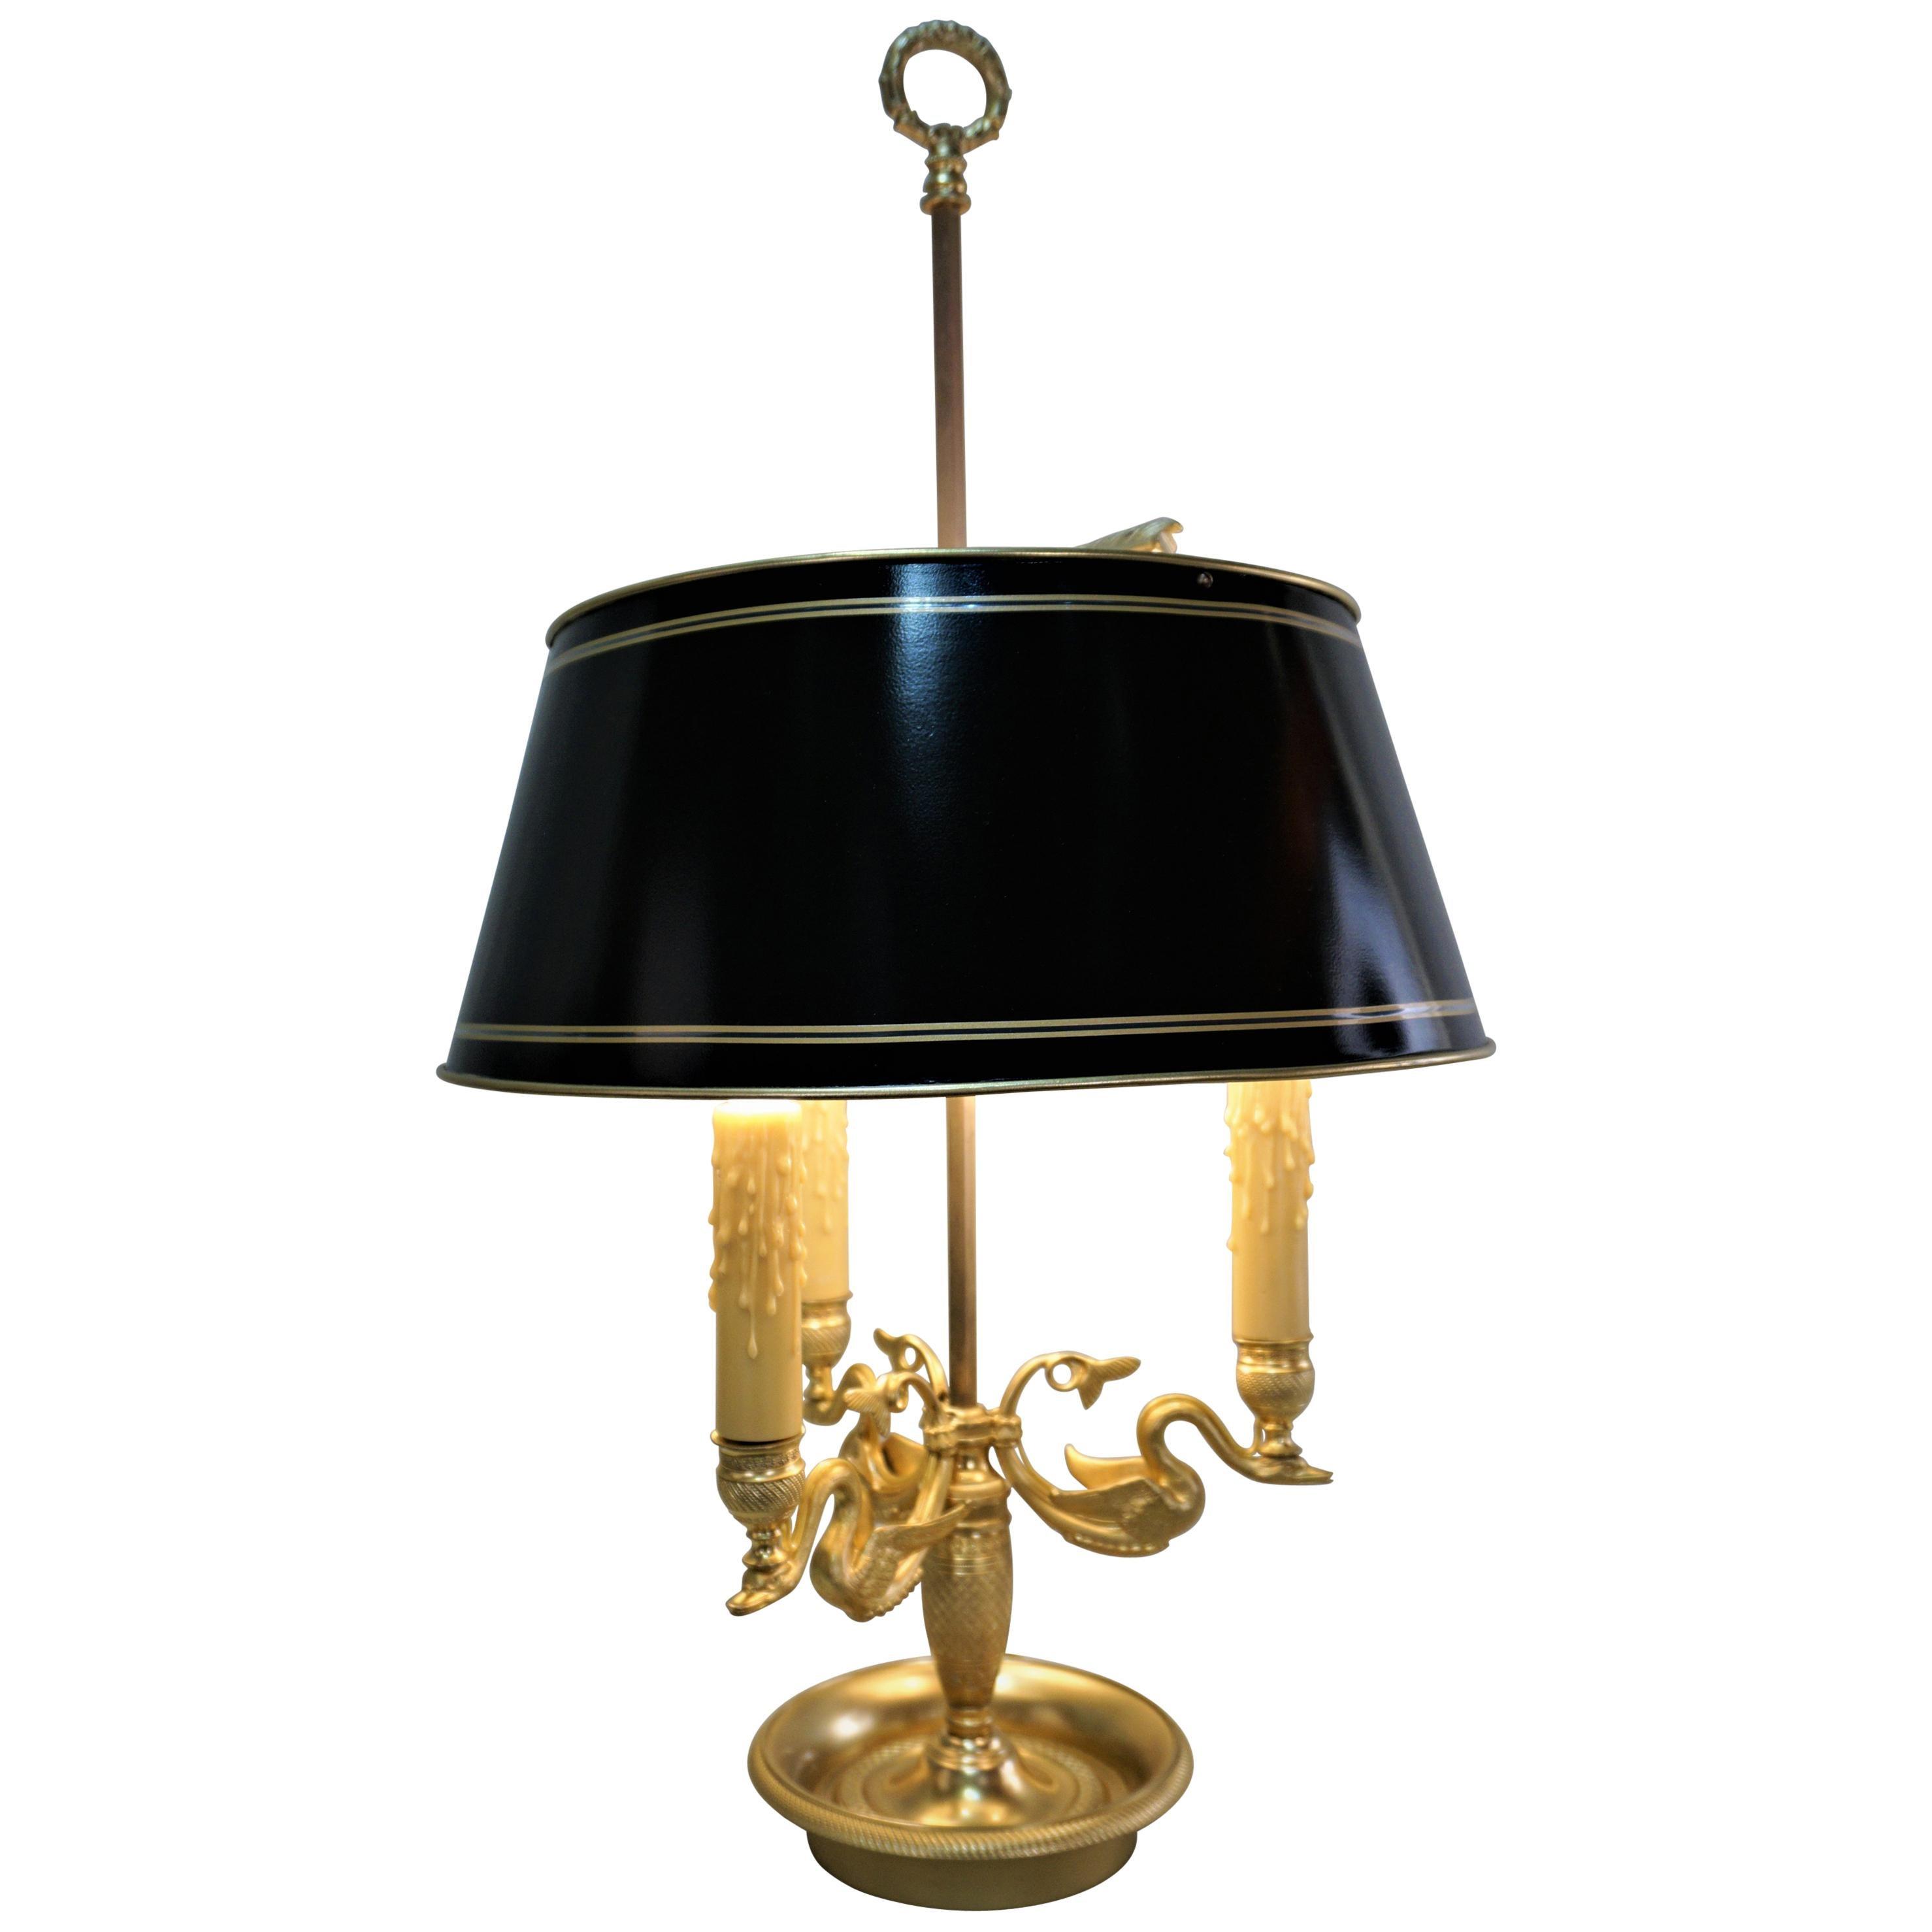 French Early 20th Century Dore Bronze Bouillotte Desk Lamp